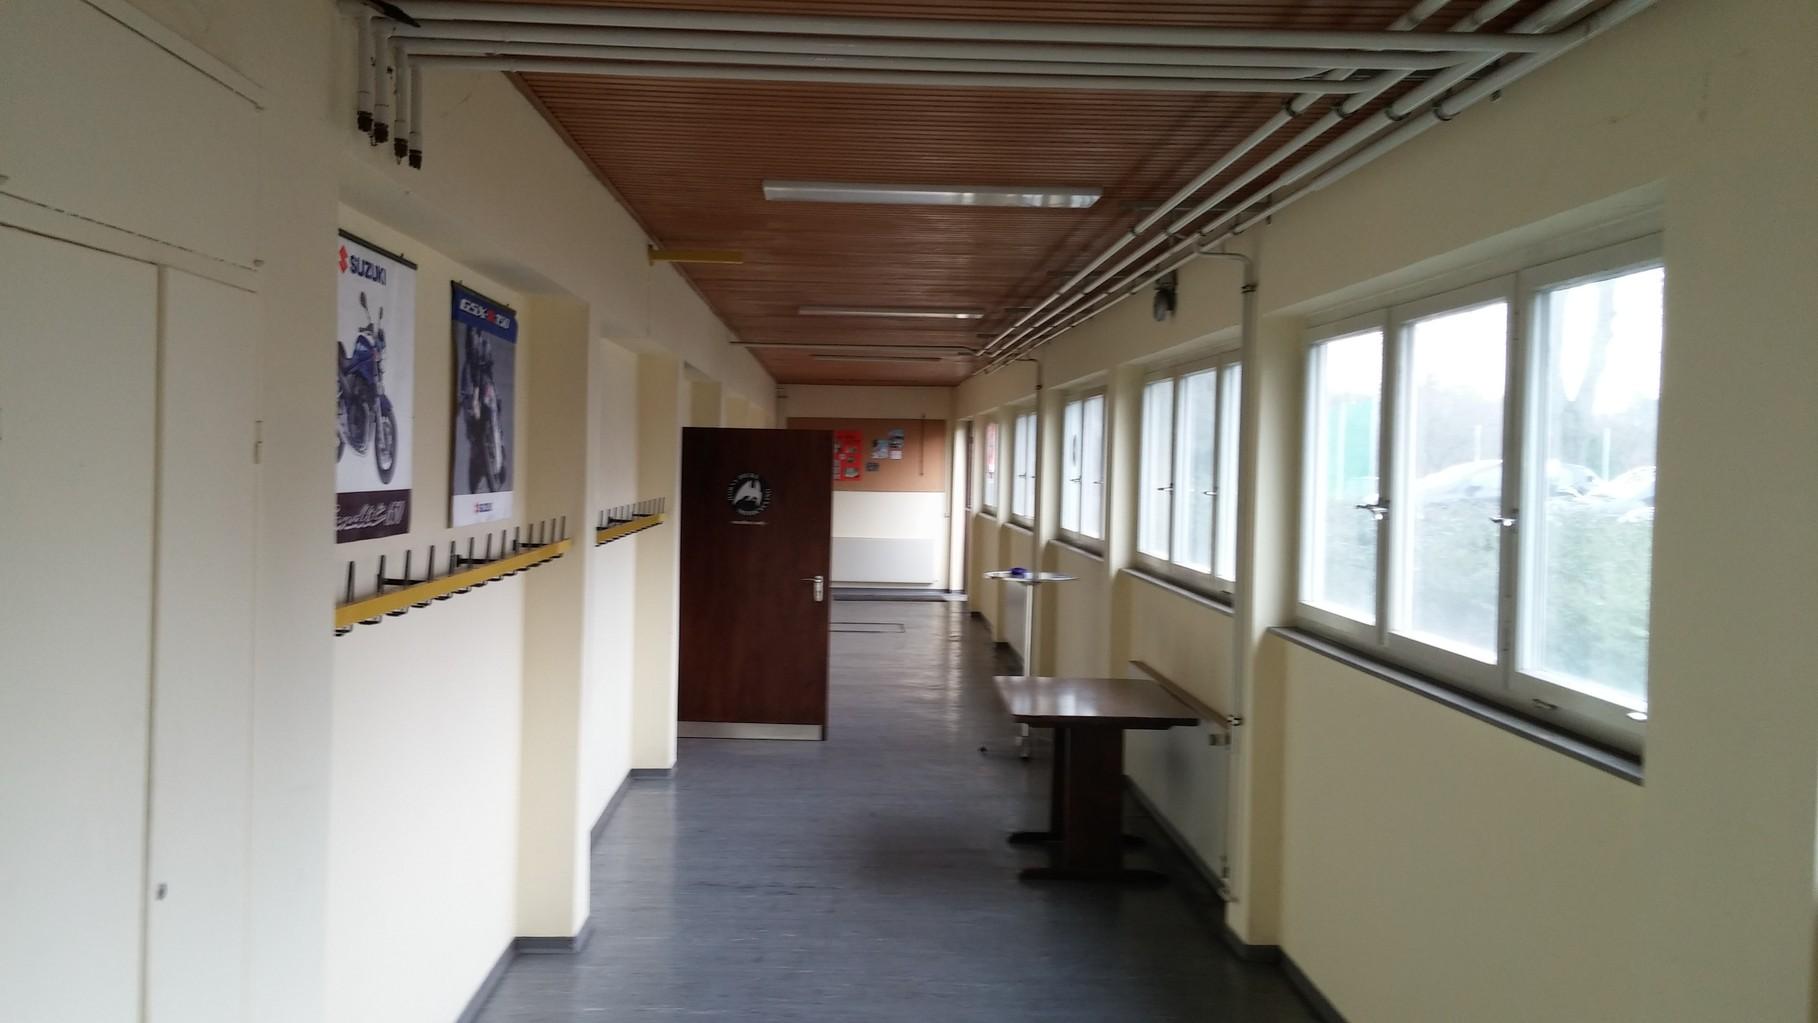 Grundschule Altforweiler (Horny Dicks e.V.) VORHER